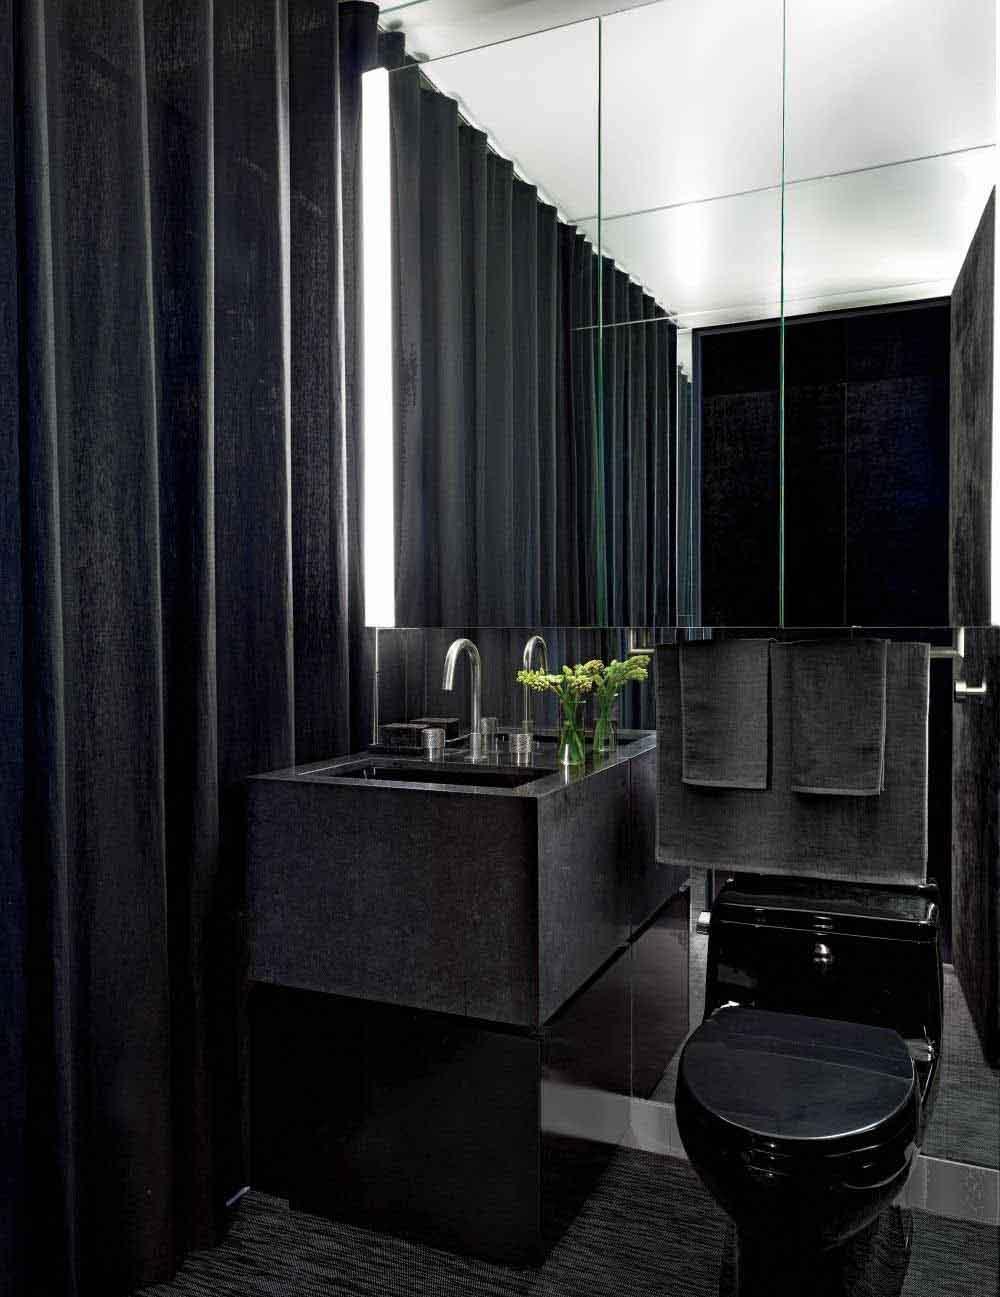 siyah-küçük-tuvalet-modeli-wc-dekor